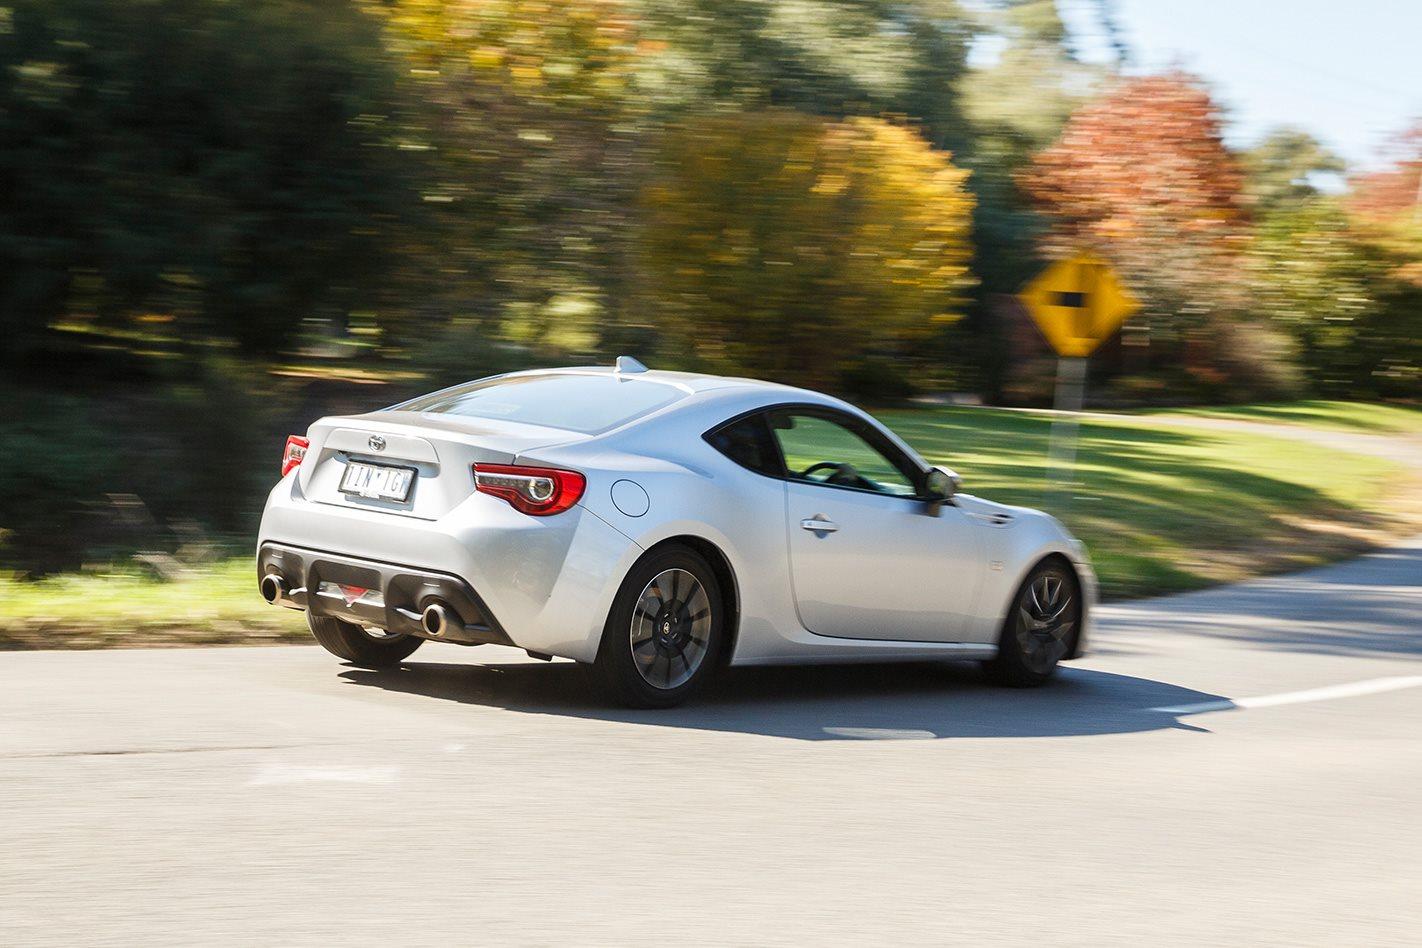 2017 Toyota 86 rear